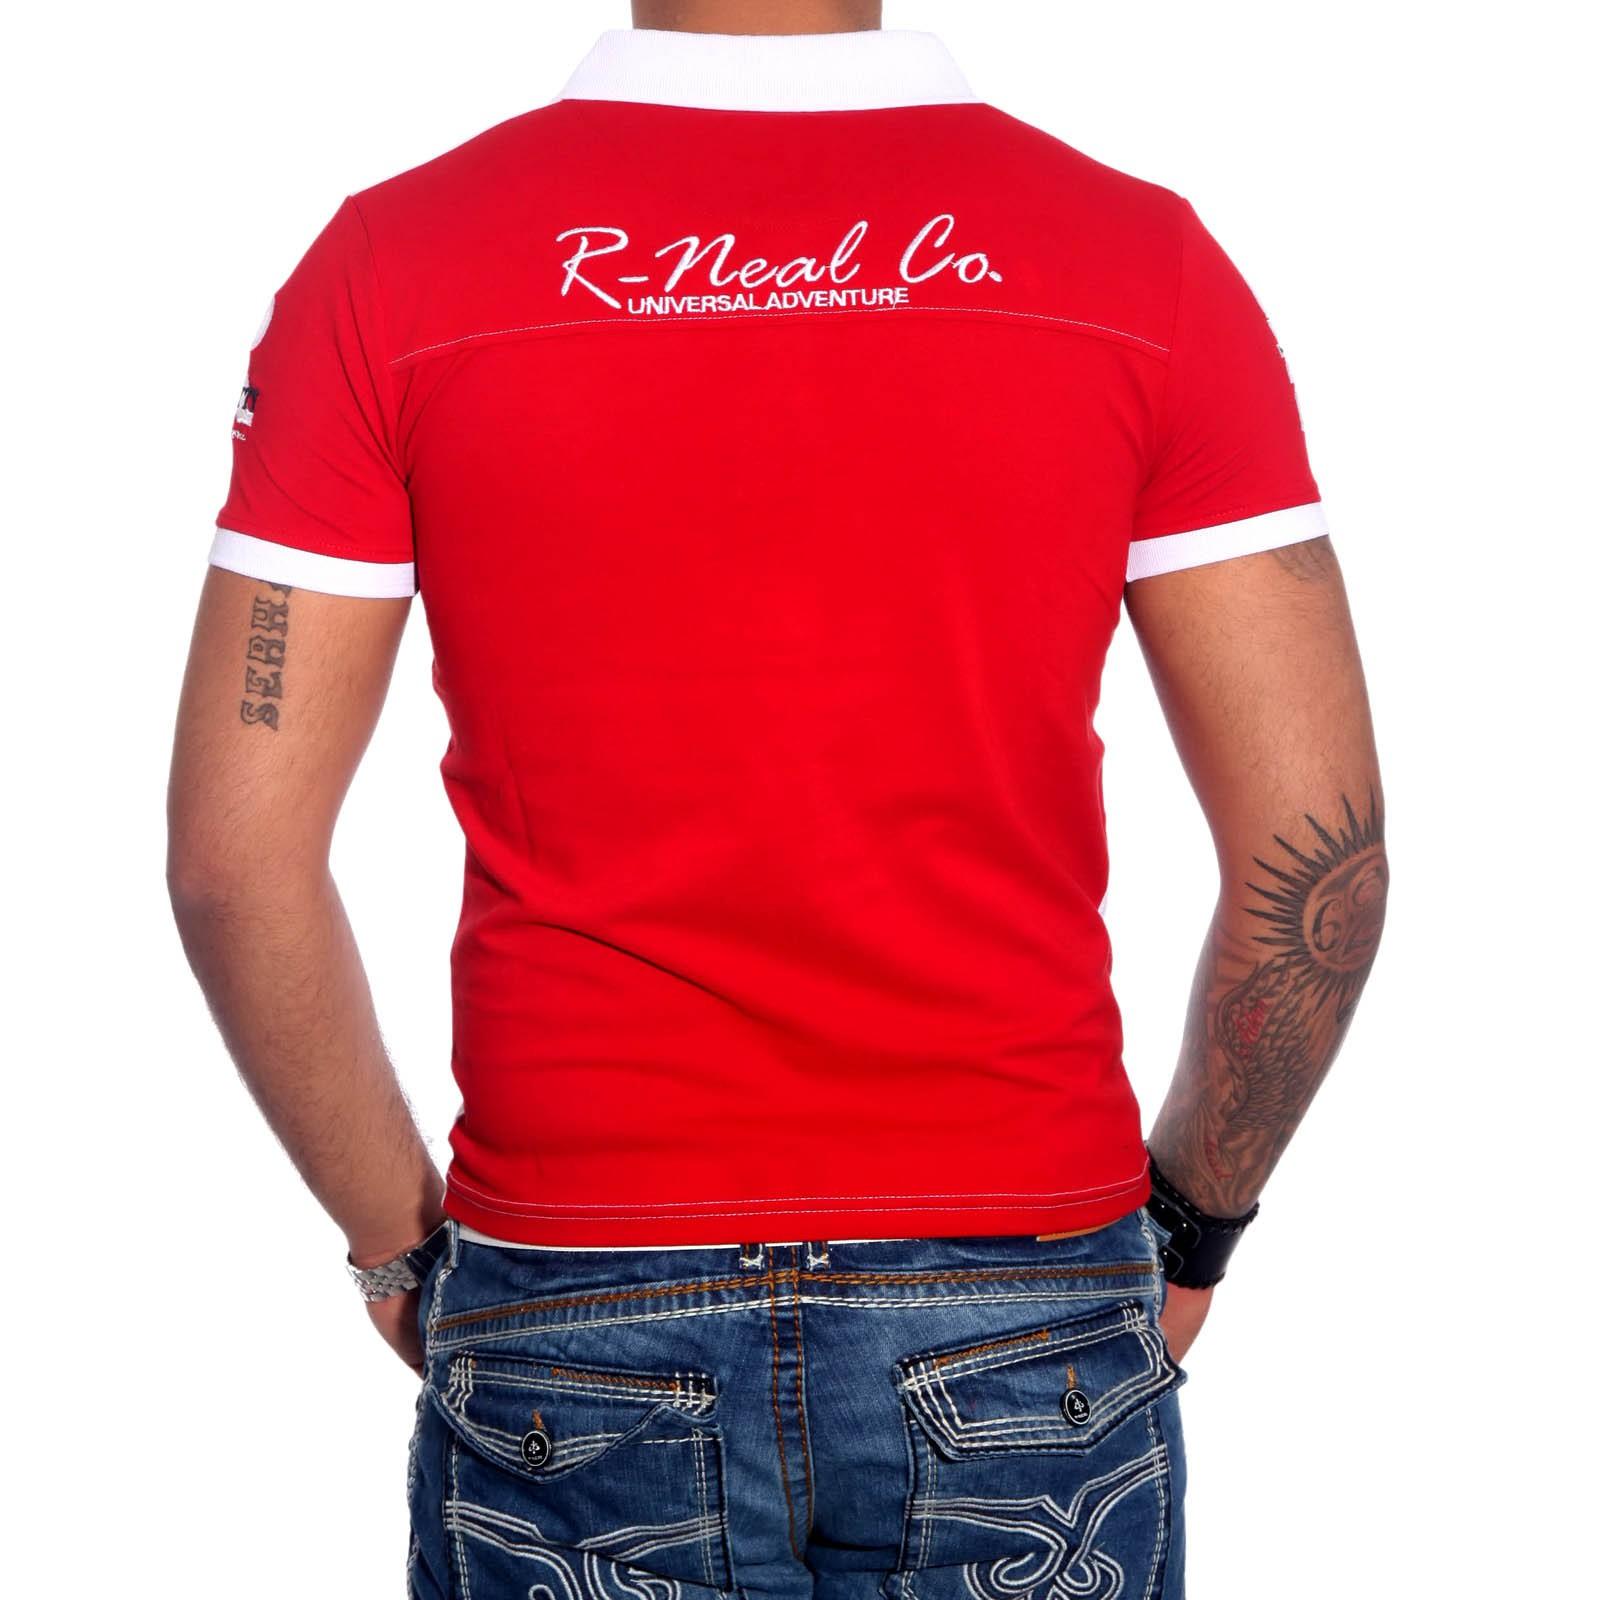 Poloshirt 6686 R-Neal